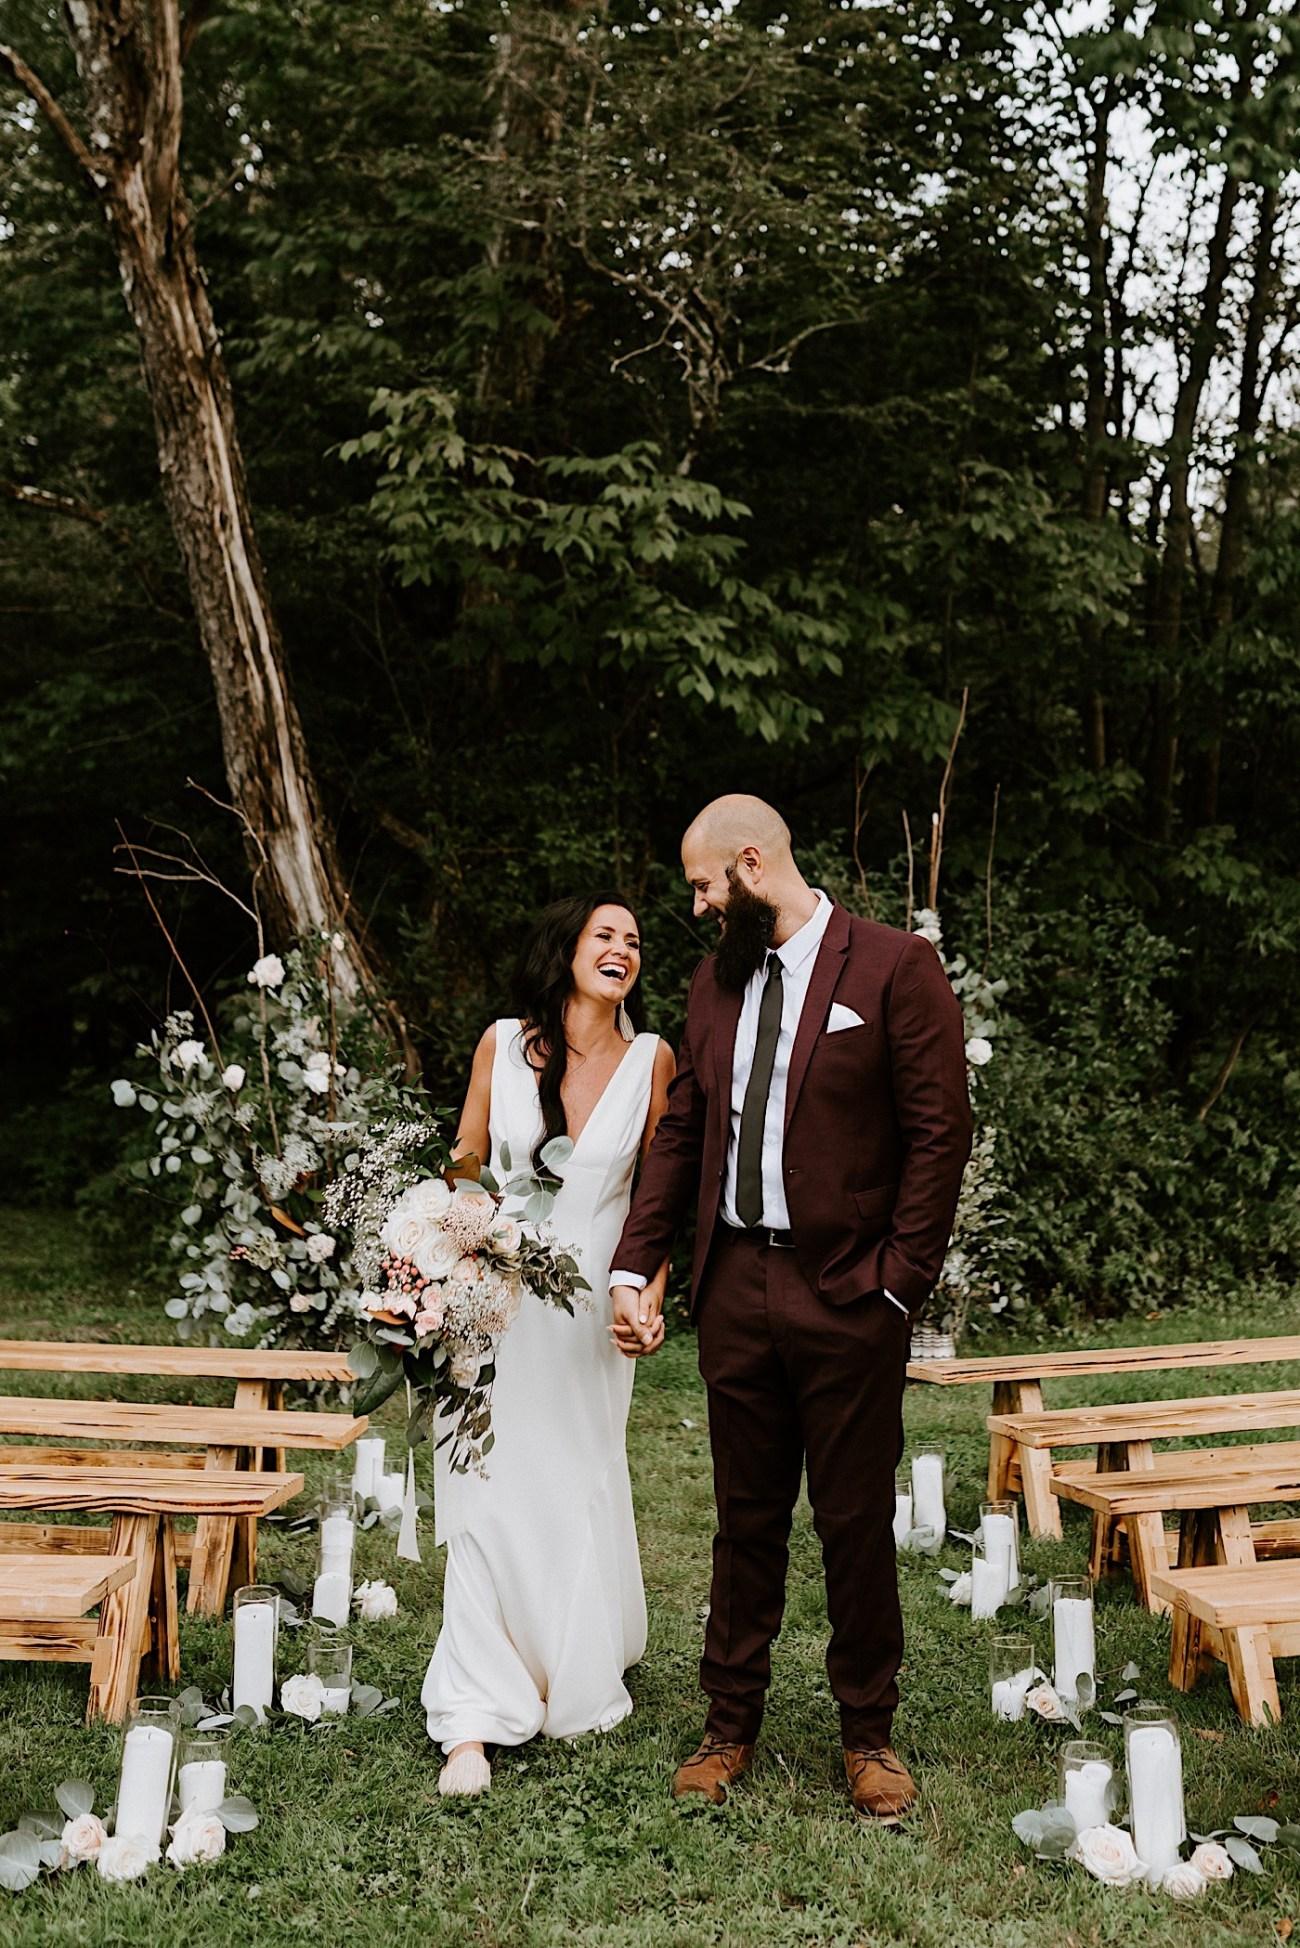 Gilbertsville Farmhouse Wedding Barn Inspiration Wedding Upstate New York Wedding Catskill Hudsonvalley Wedding 29